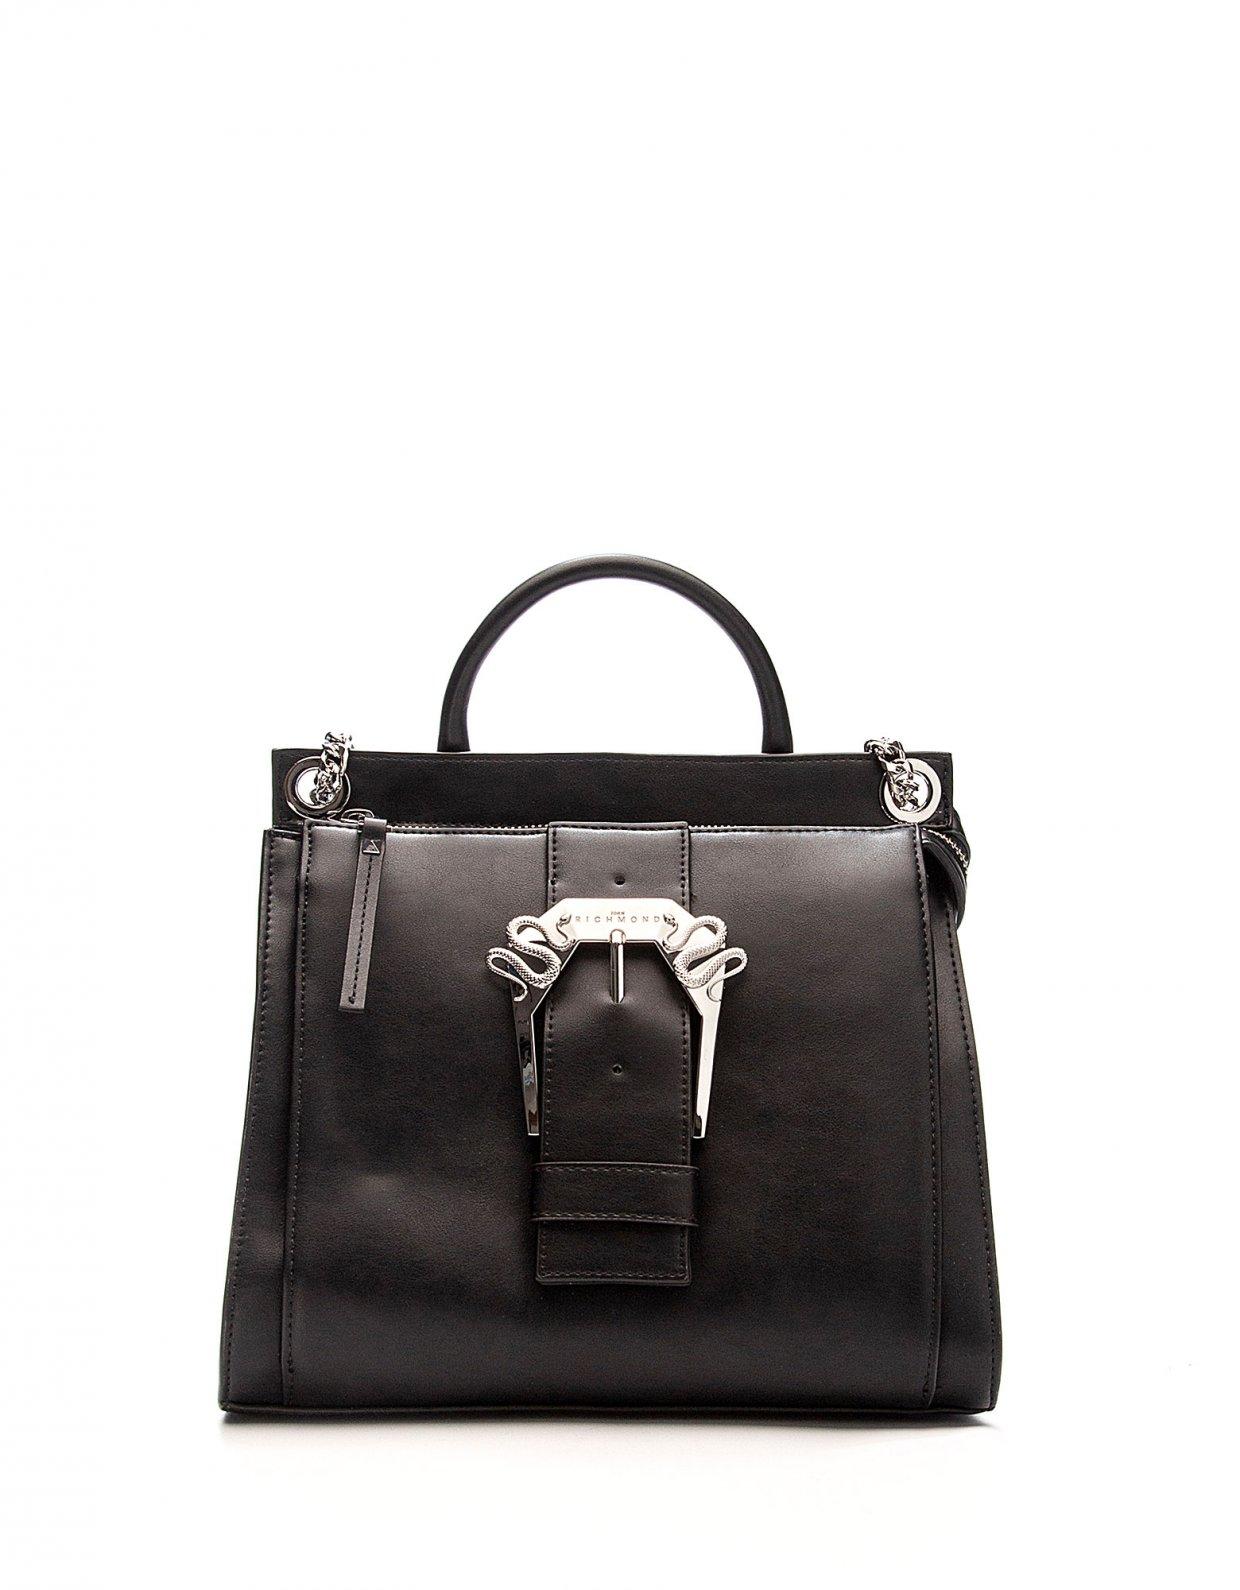 John Richmond Handbag Tustin black